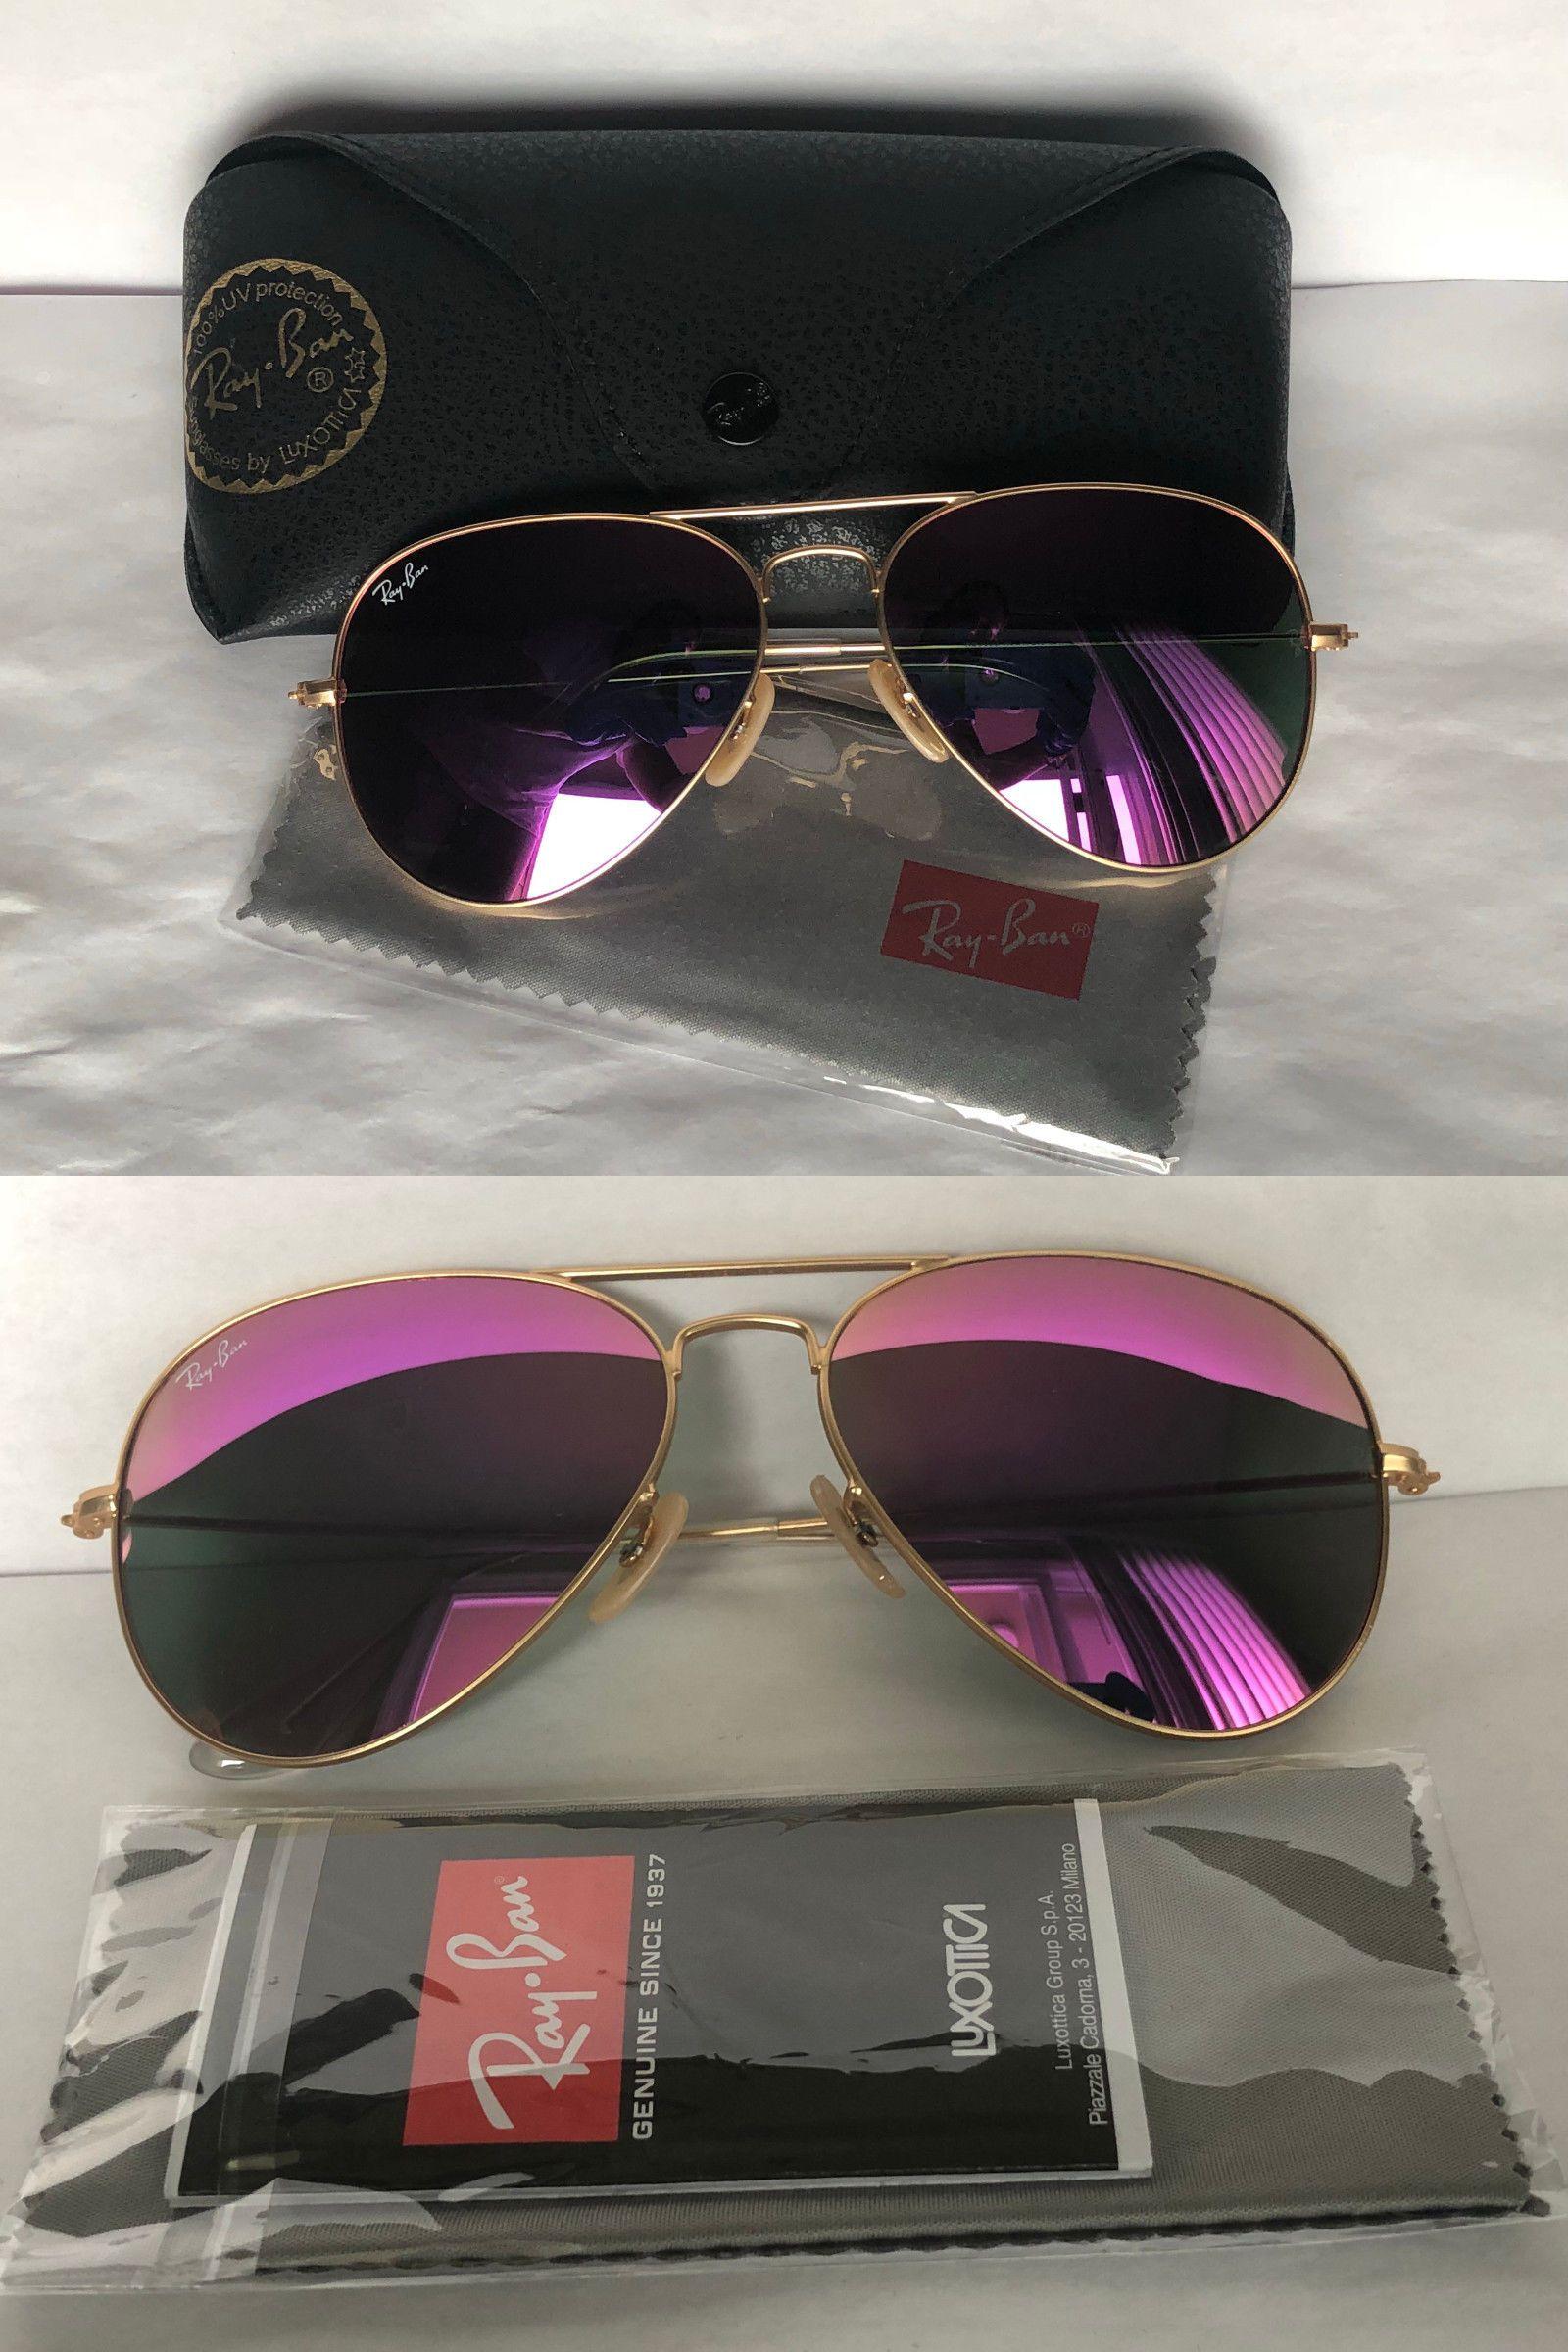 90e98a7c1 ... cheap sunglasses 155189 ray ban rb3025 gold frame hot pink flash mirror  lens 45f08 b3781